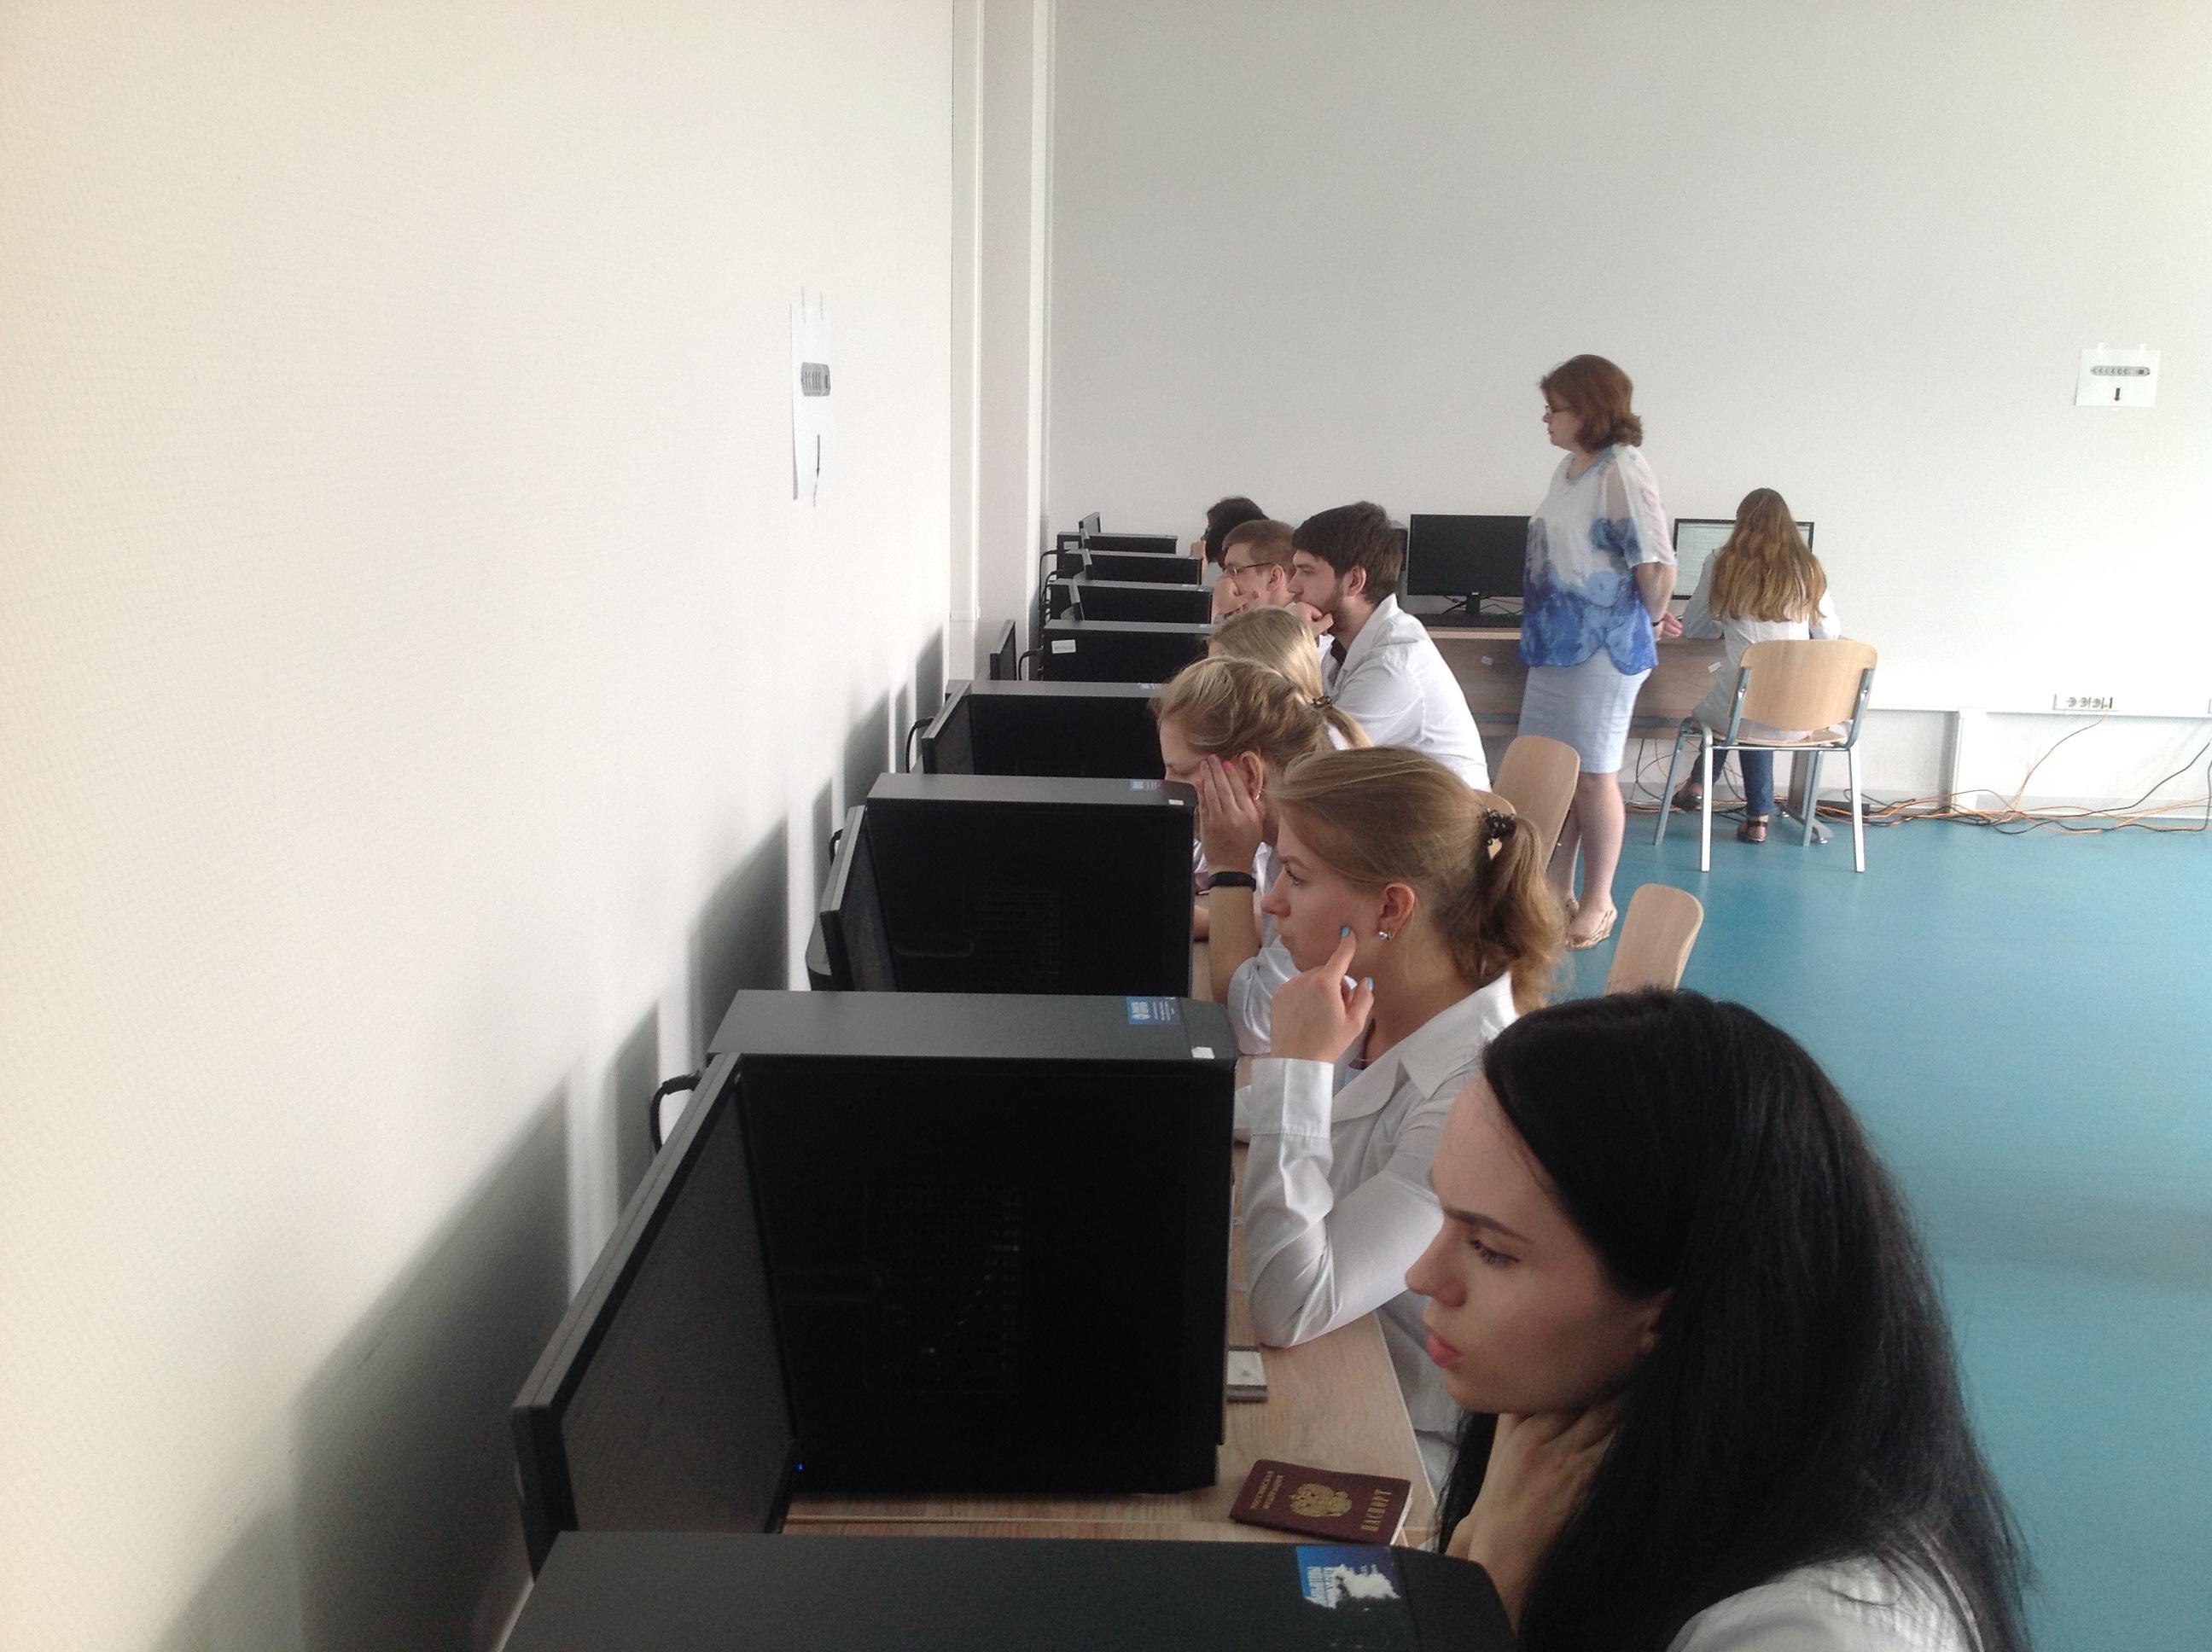 Минздрав РФ обновил положение об аккредитации специалистов